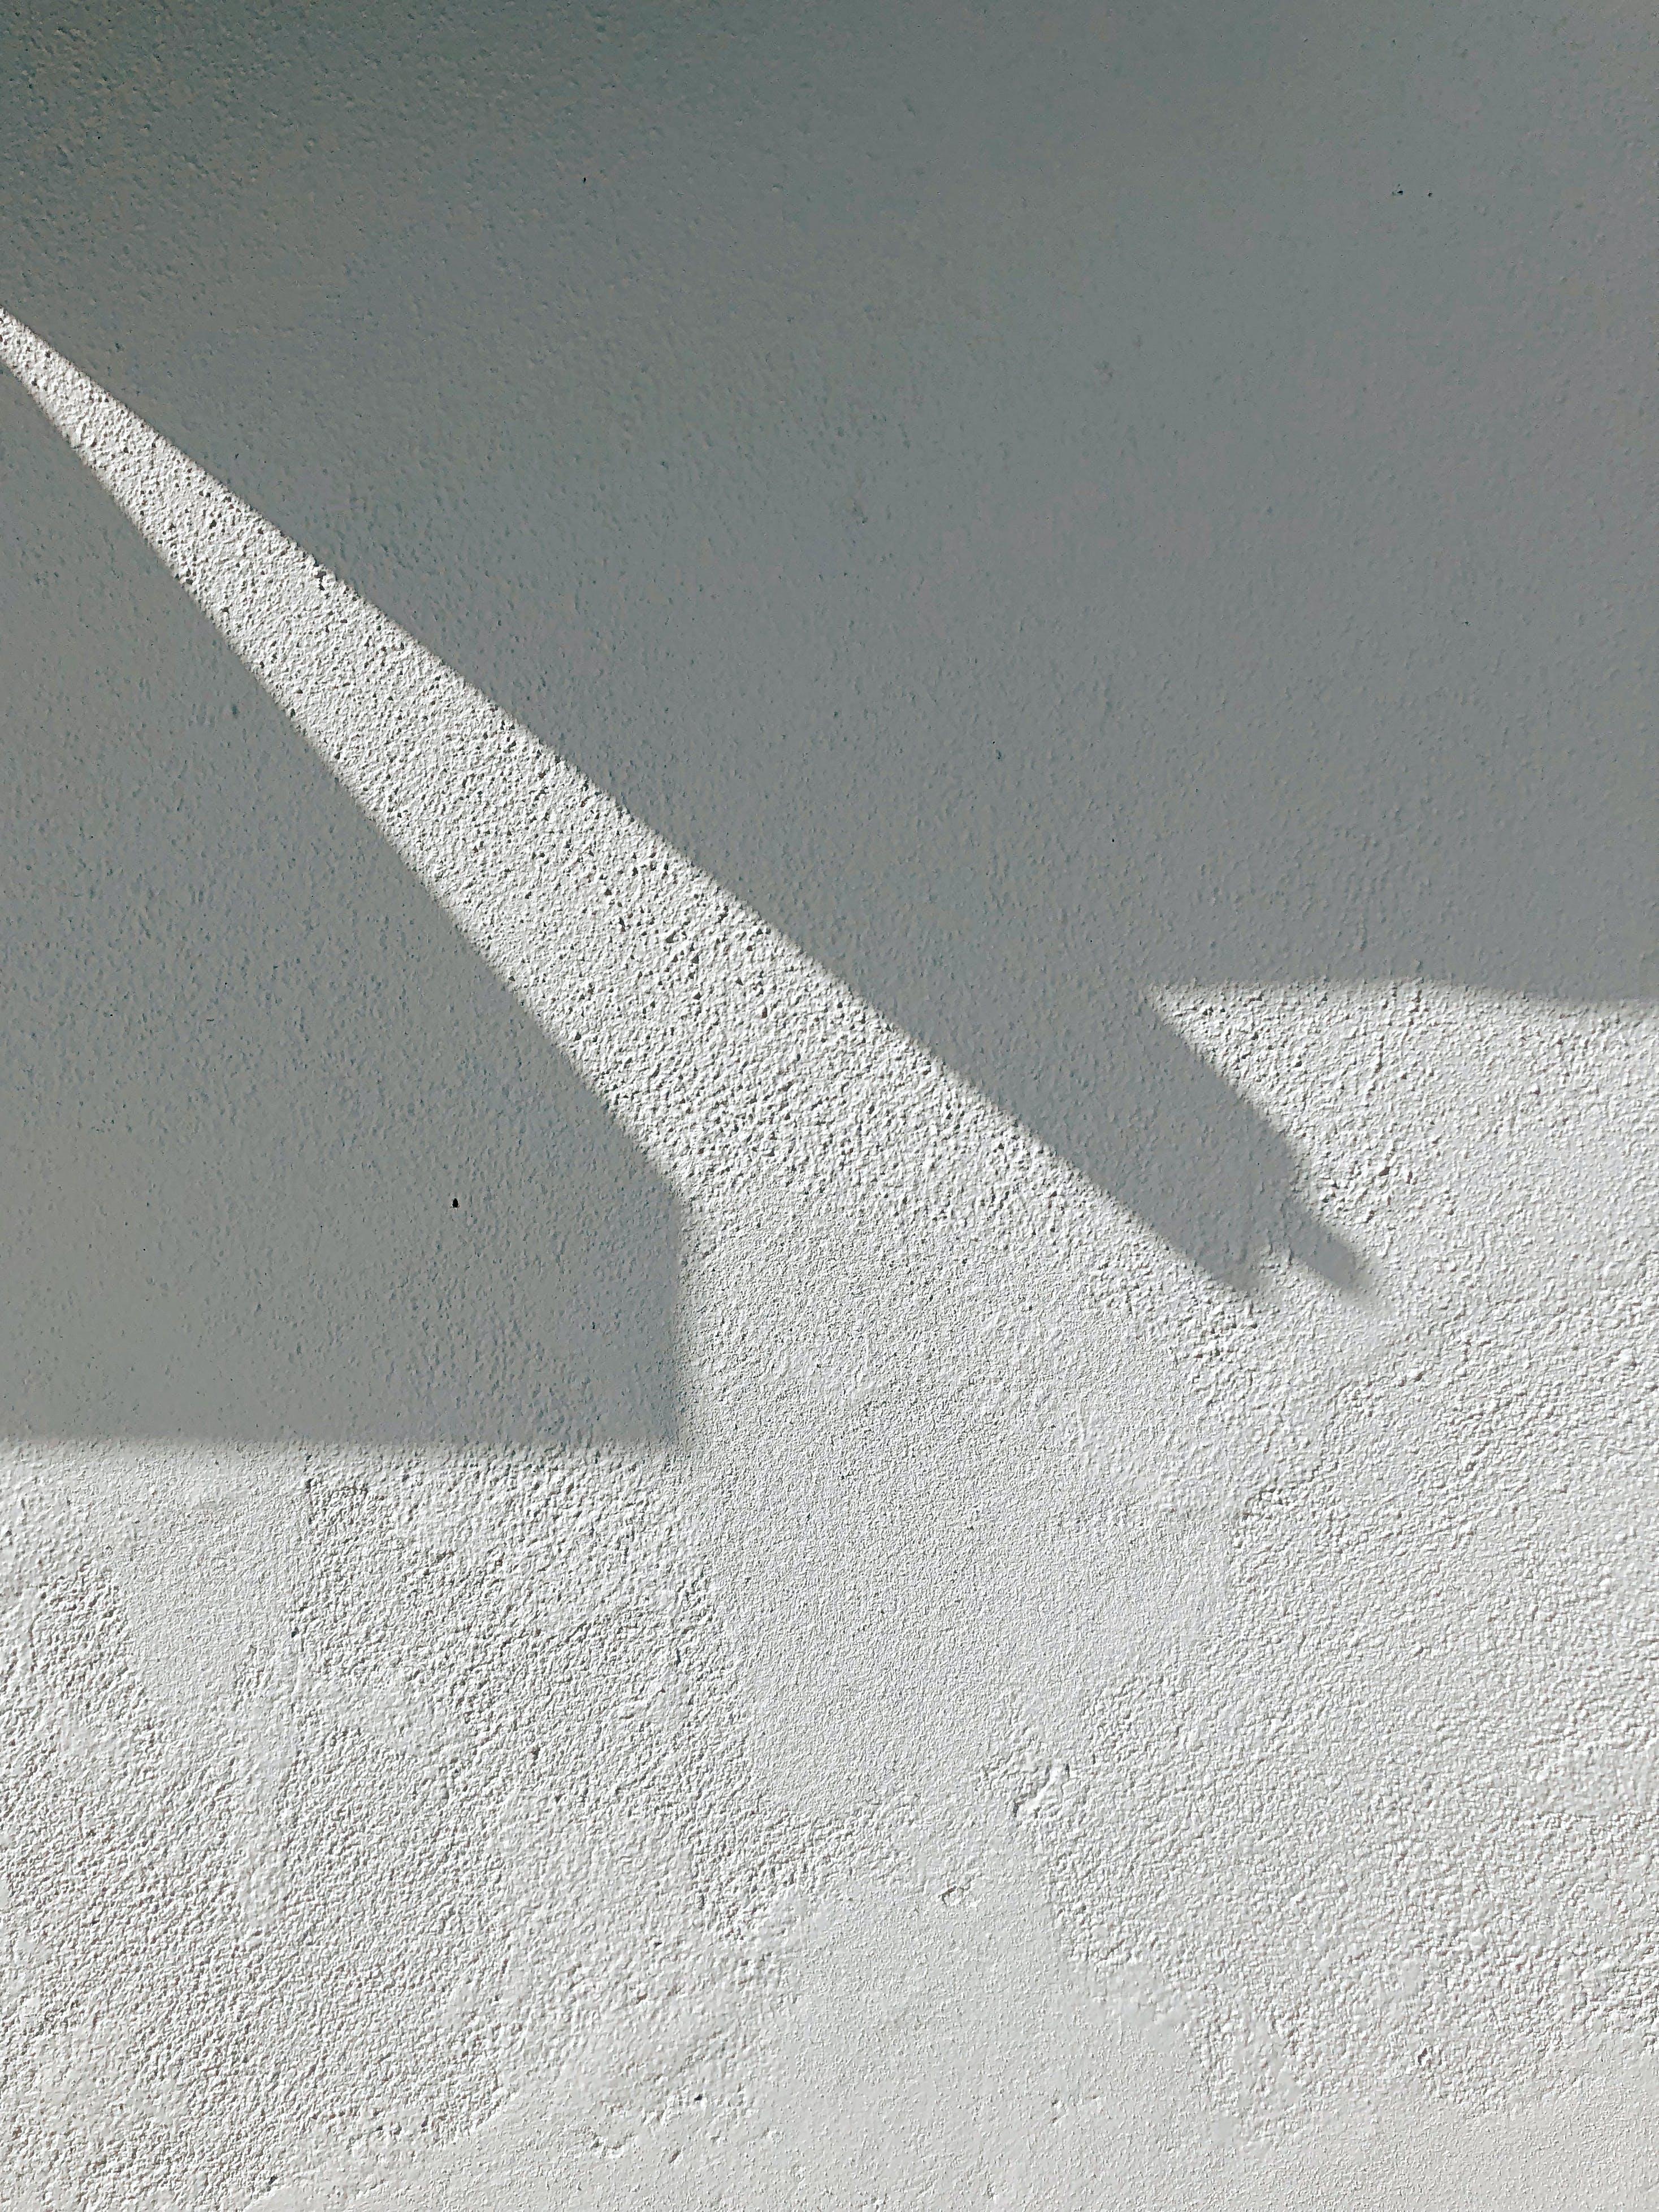 concrete, daylight, exterior